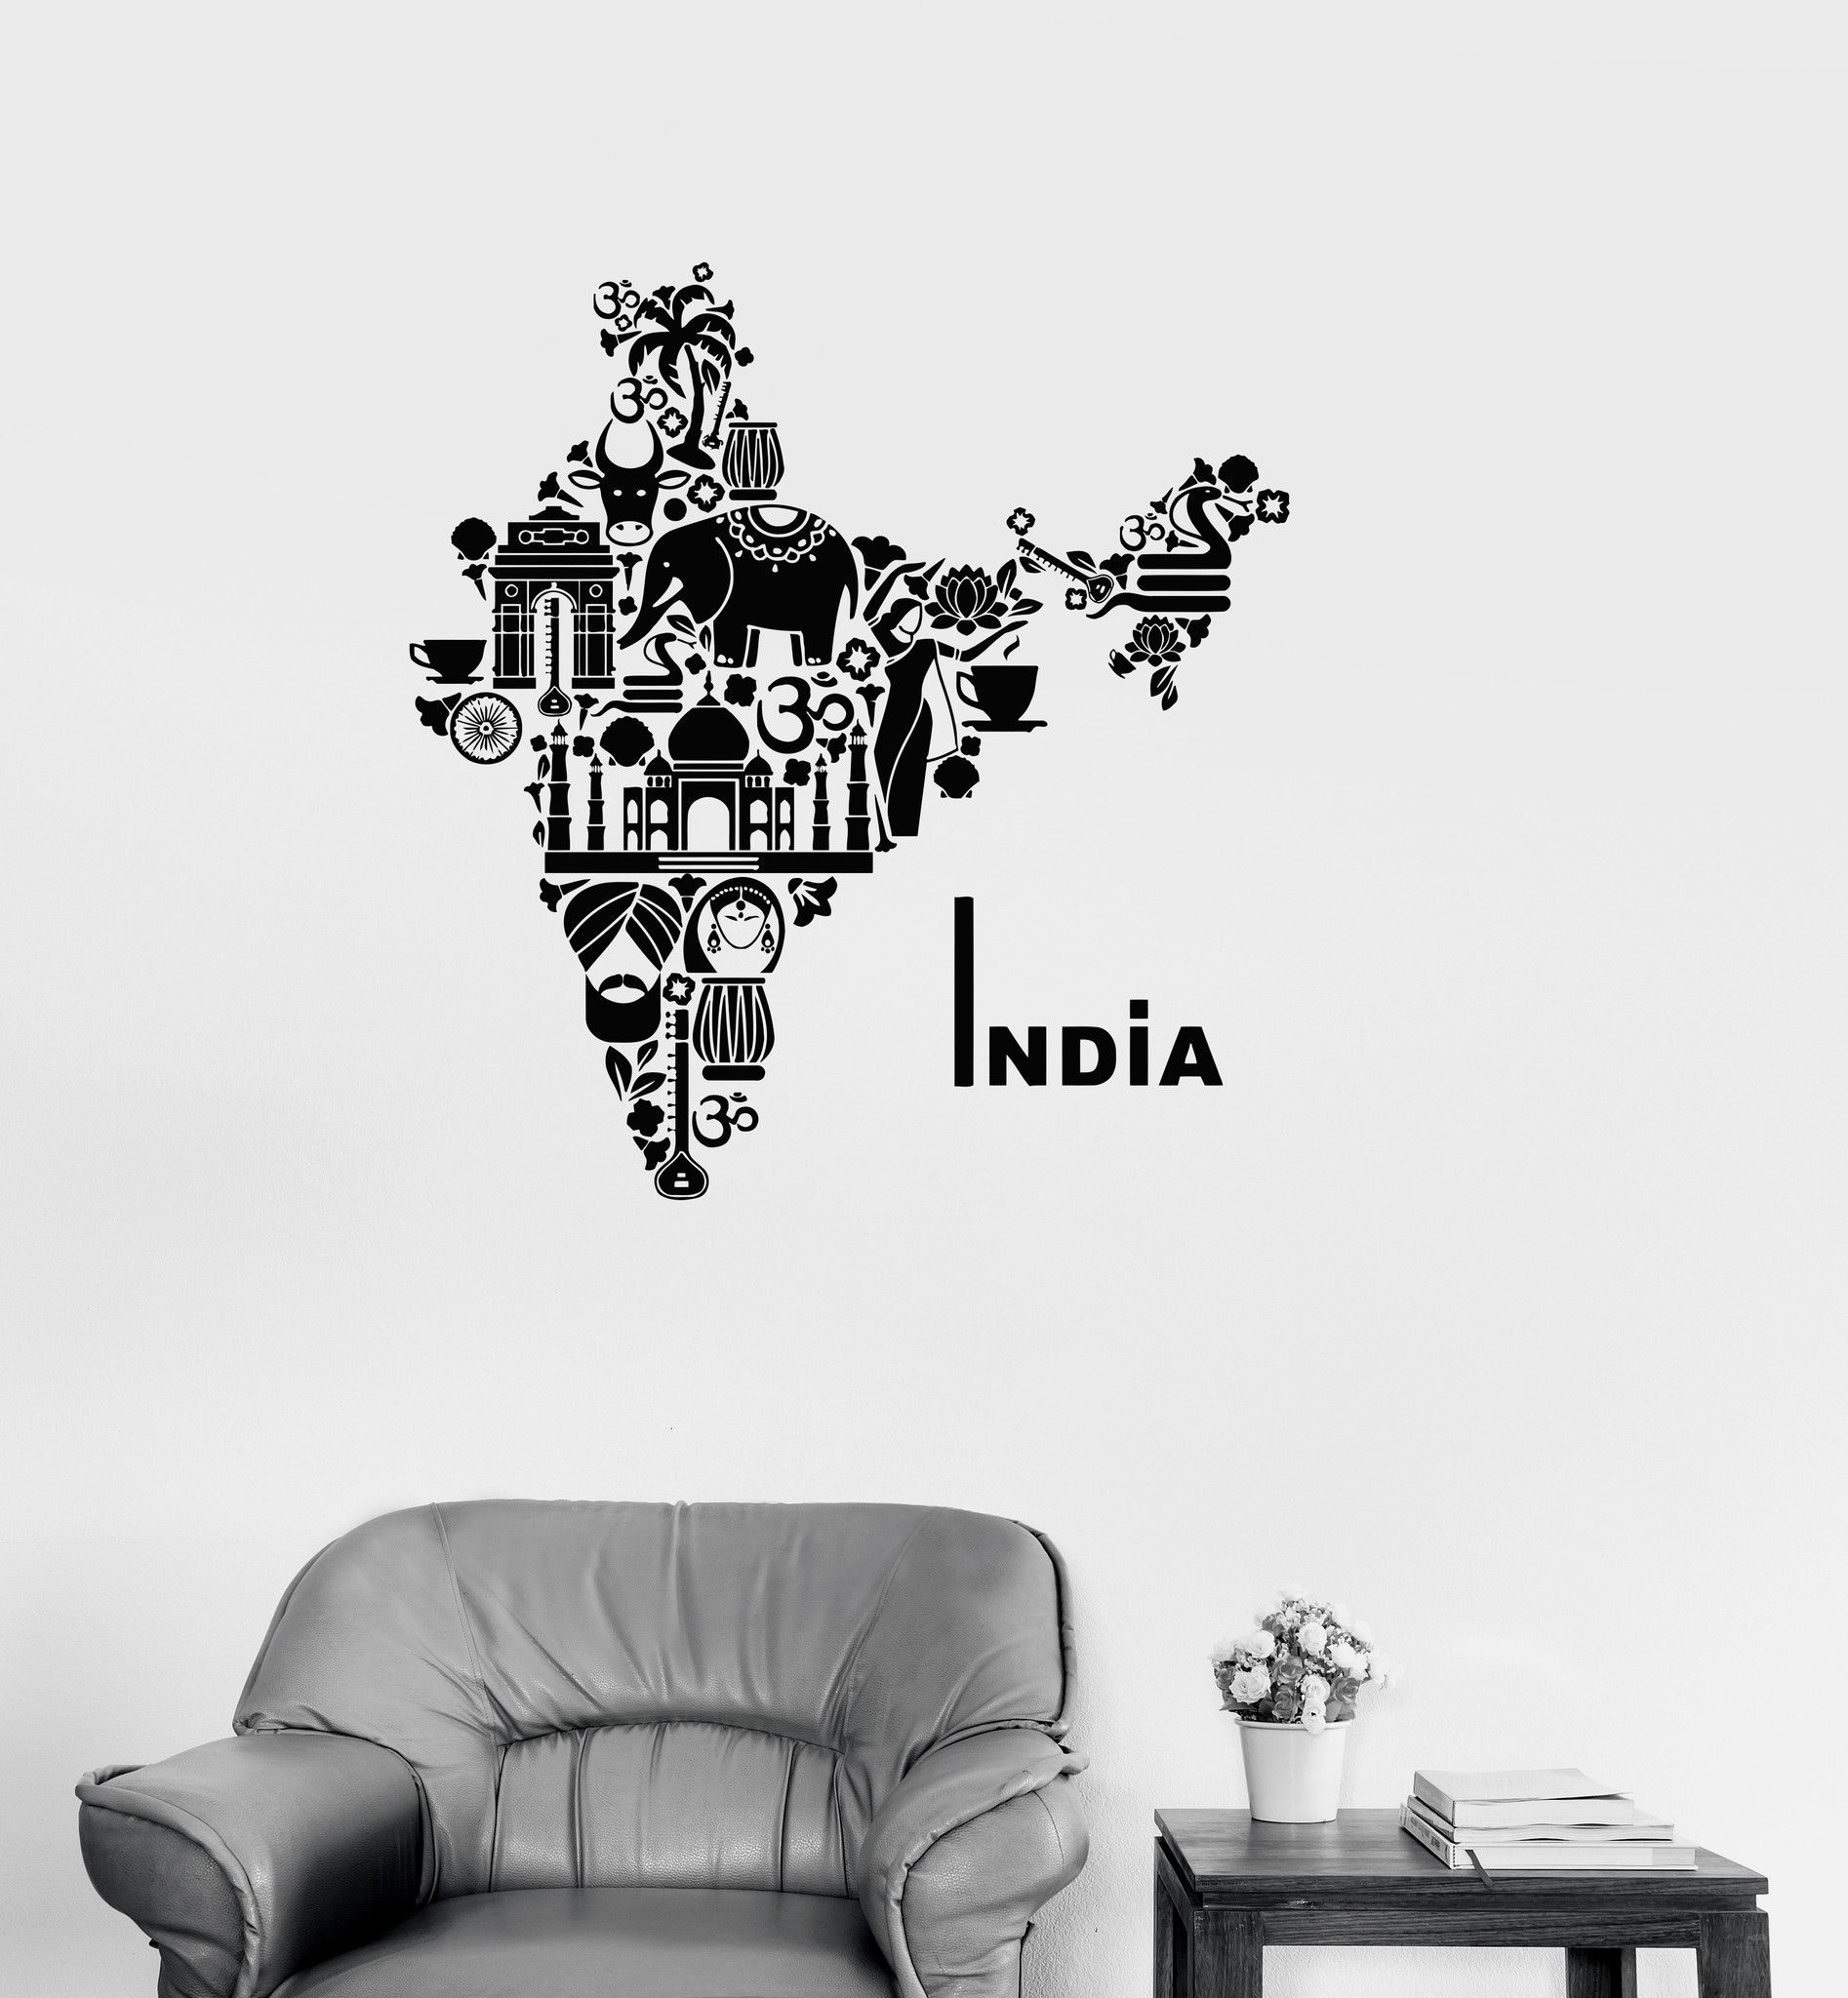 Vinyl decal india map hindu hinduism elephant symbols decor wall stickers ig also rh pinterest